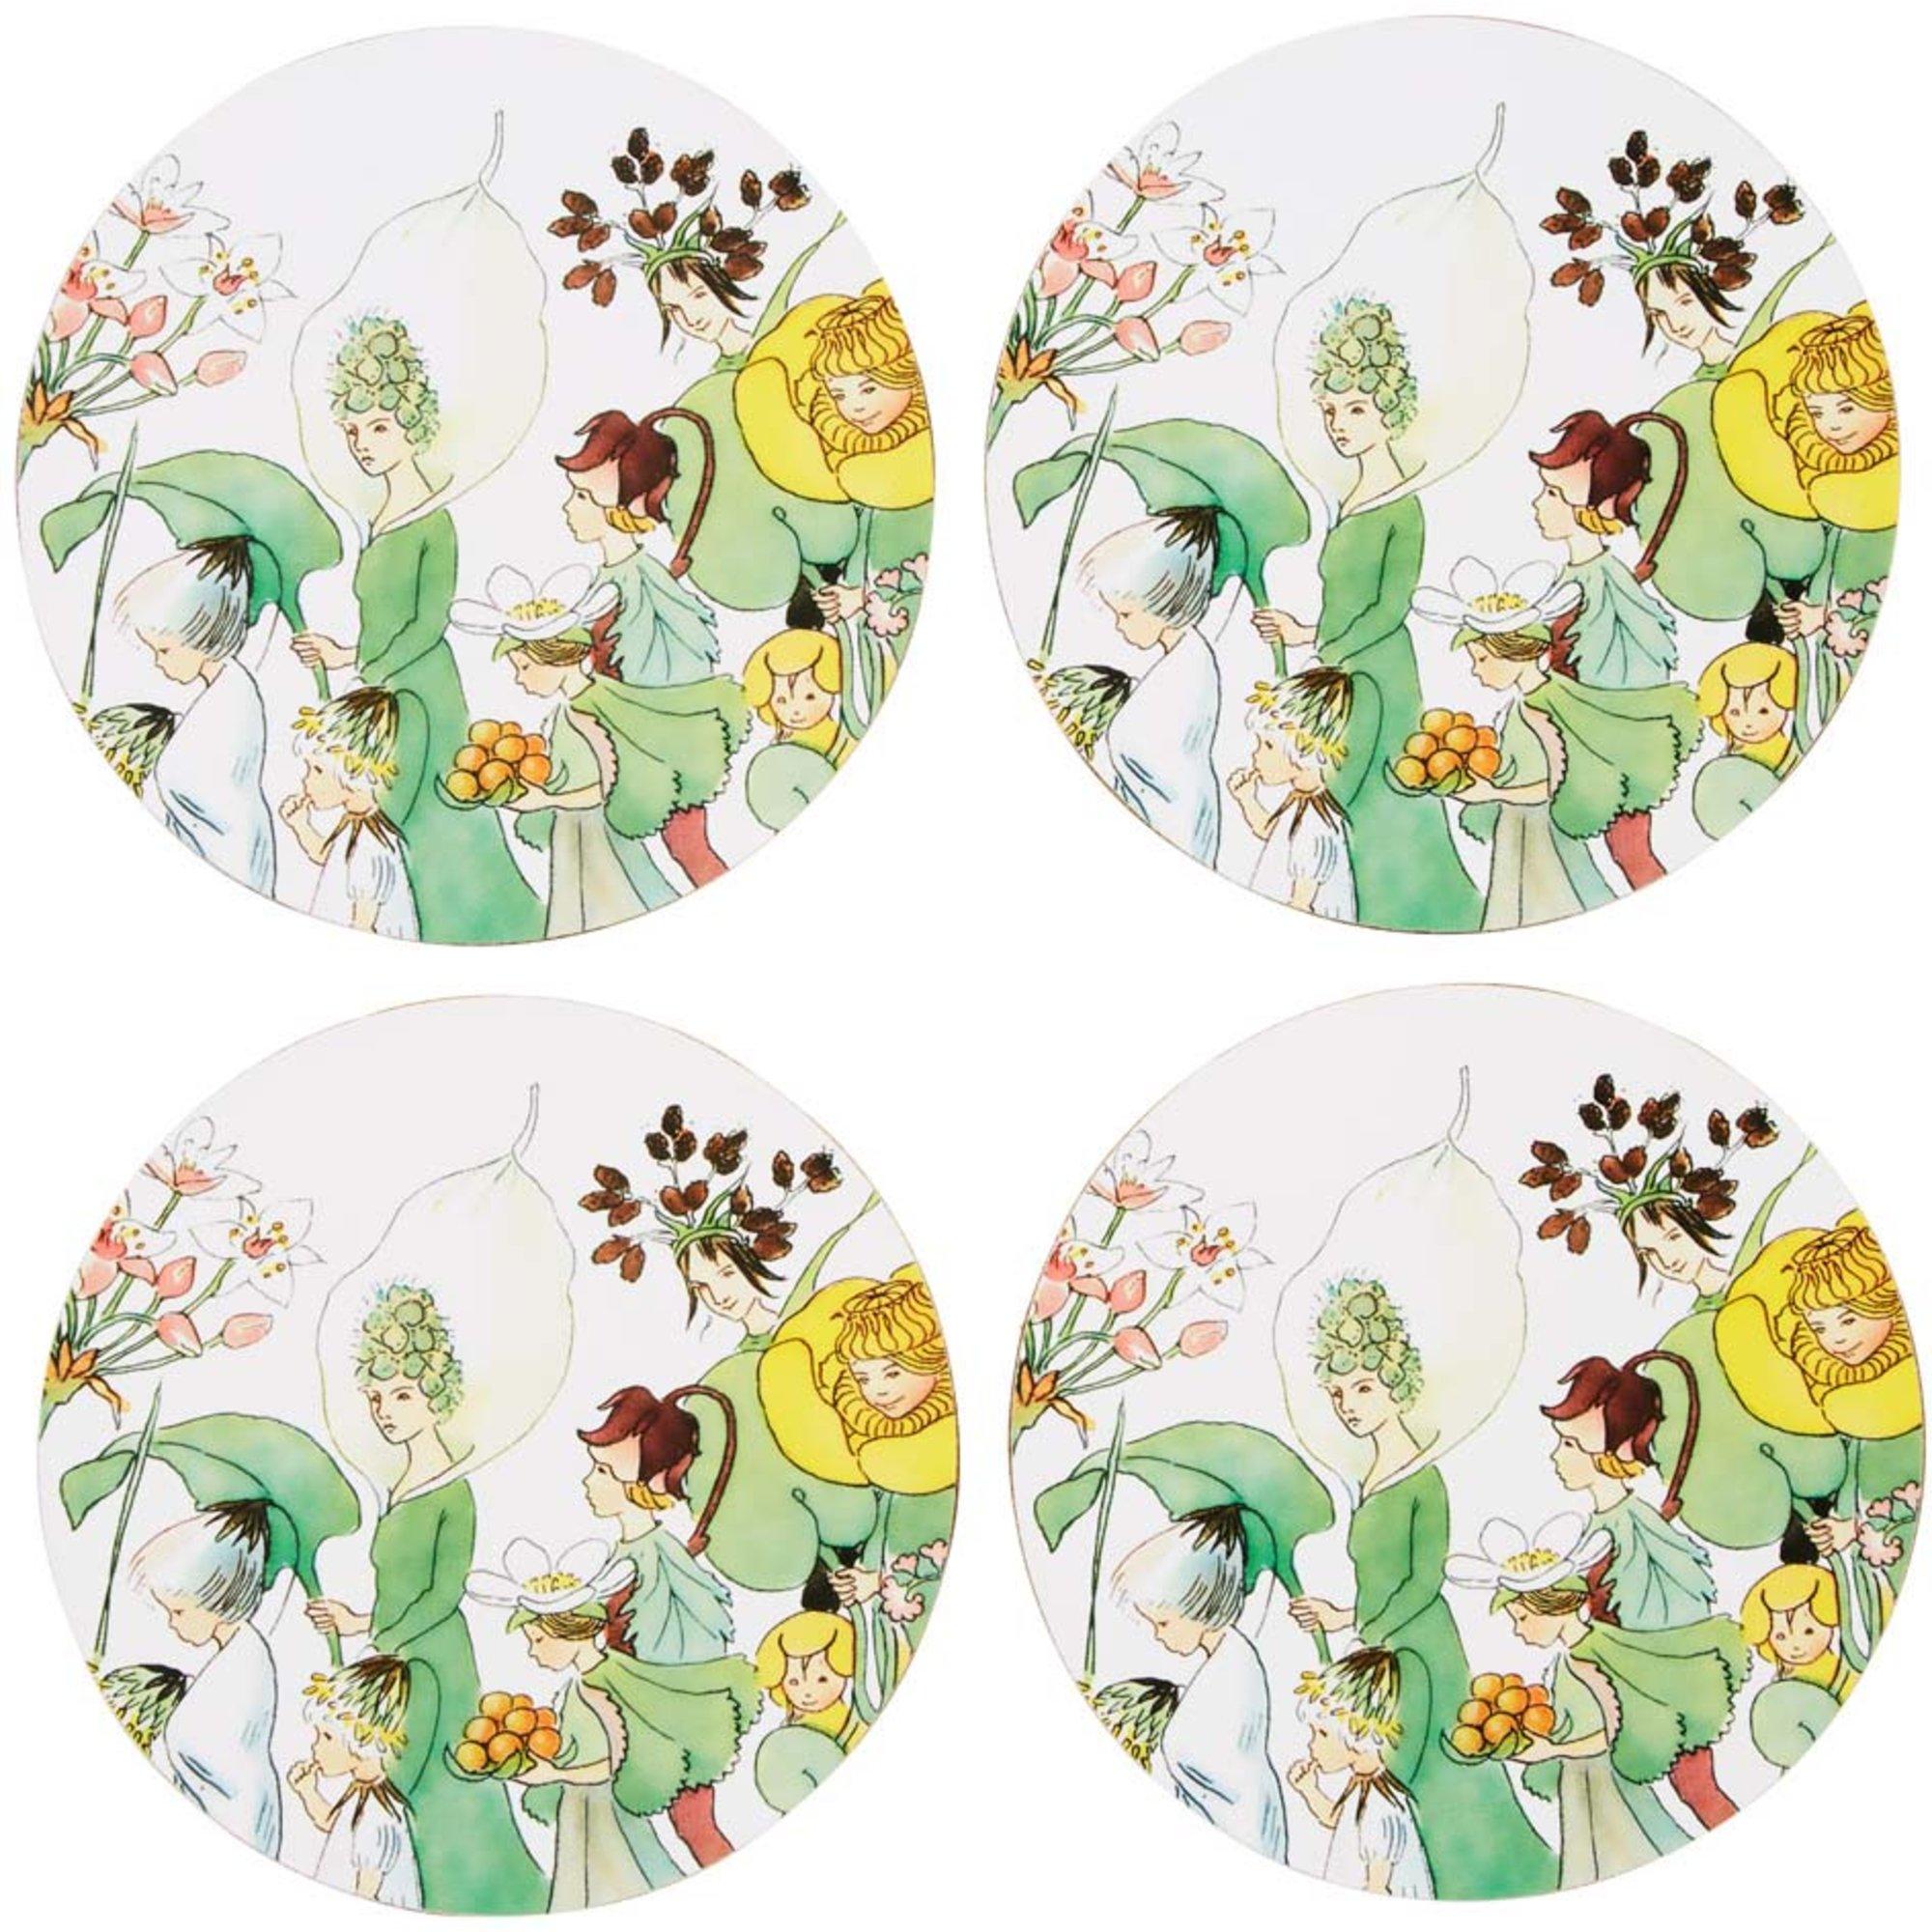 Elsa Beskow Glasunderlägg 4 pack Tryck med kork Blomsterparaden